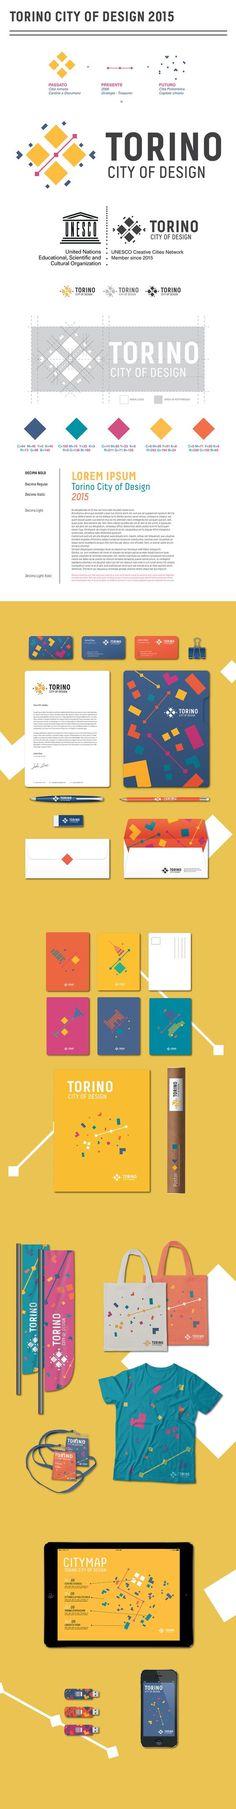 Torino City of Design 2015 Branding by Francesca Pagliaro | Fivestar Branding – Design and Branding Agency & Inspiration Gallery